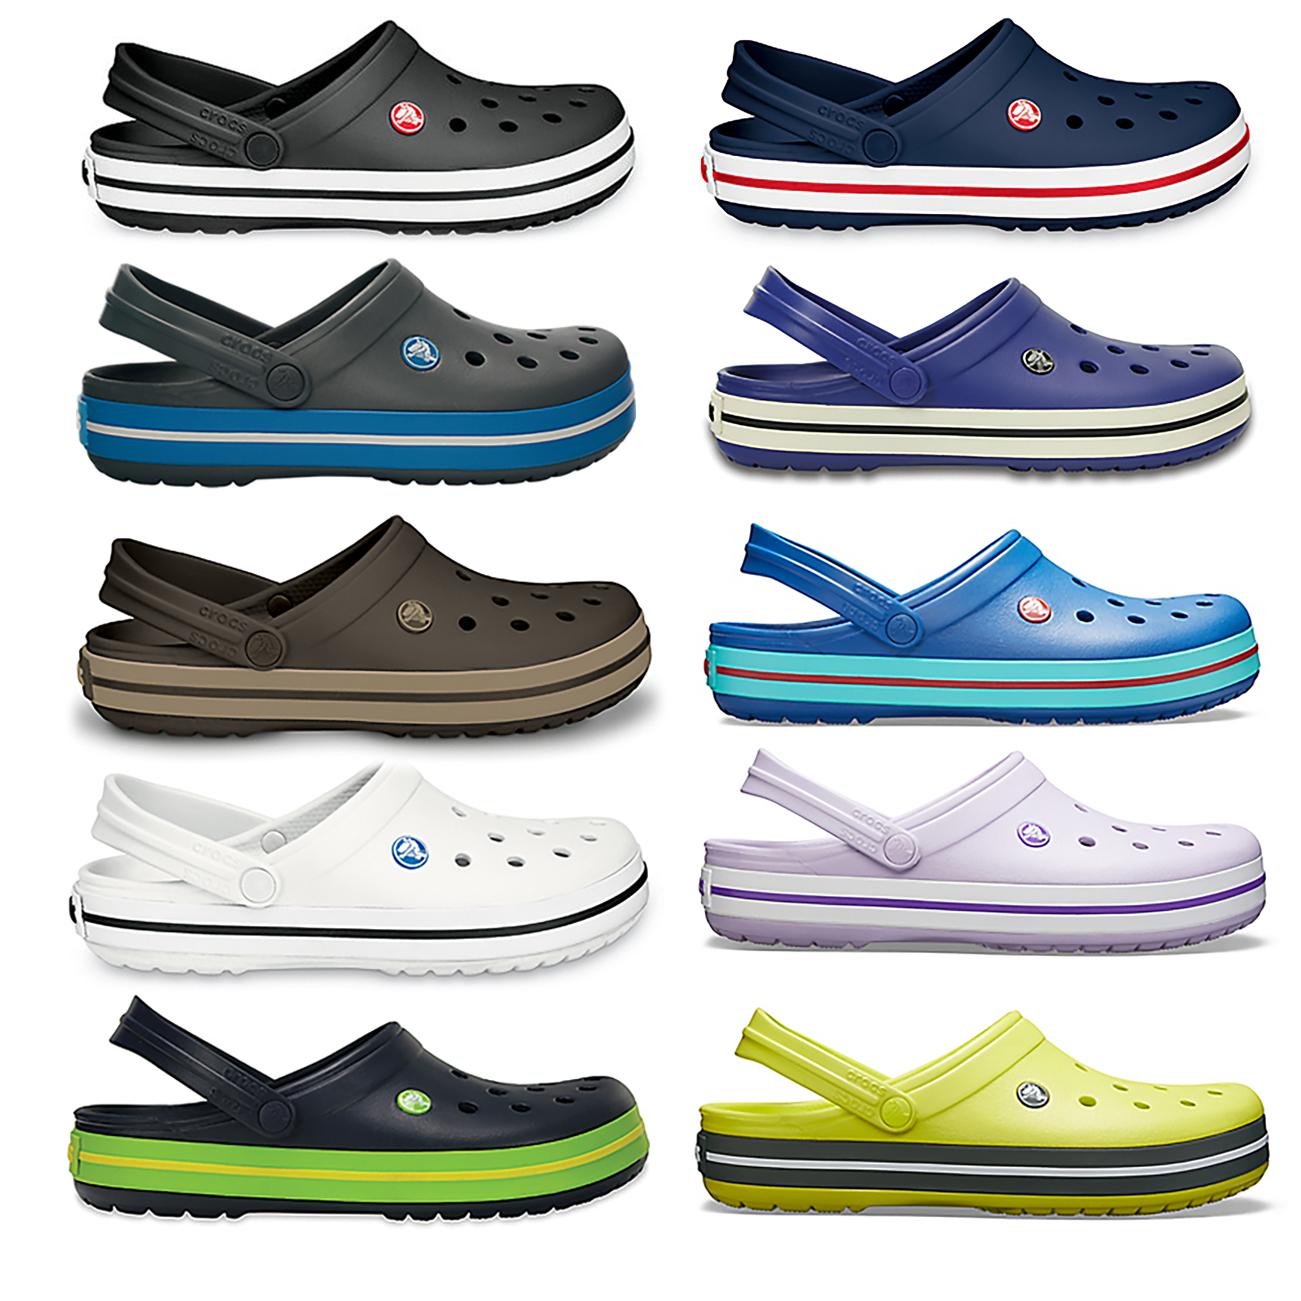 Unisex-Adults-Crocs-Crocband-Clog-Comfort-Lightweight-Water-Pool-Shoes-UK-3-16